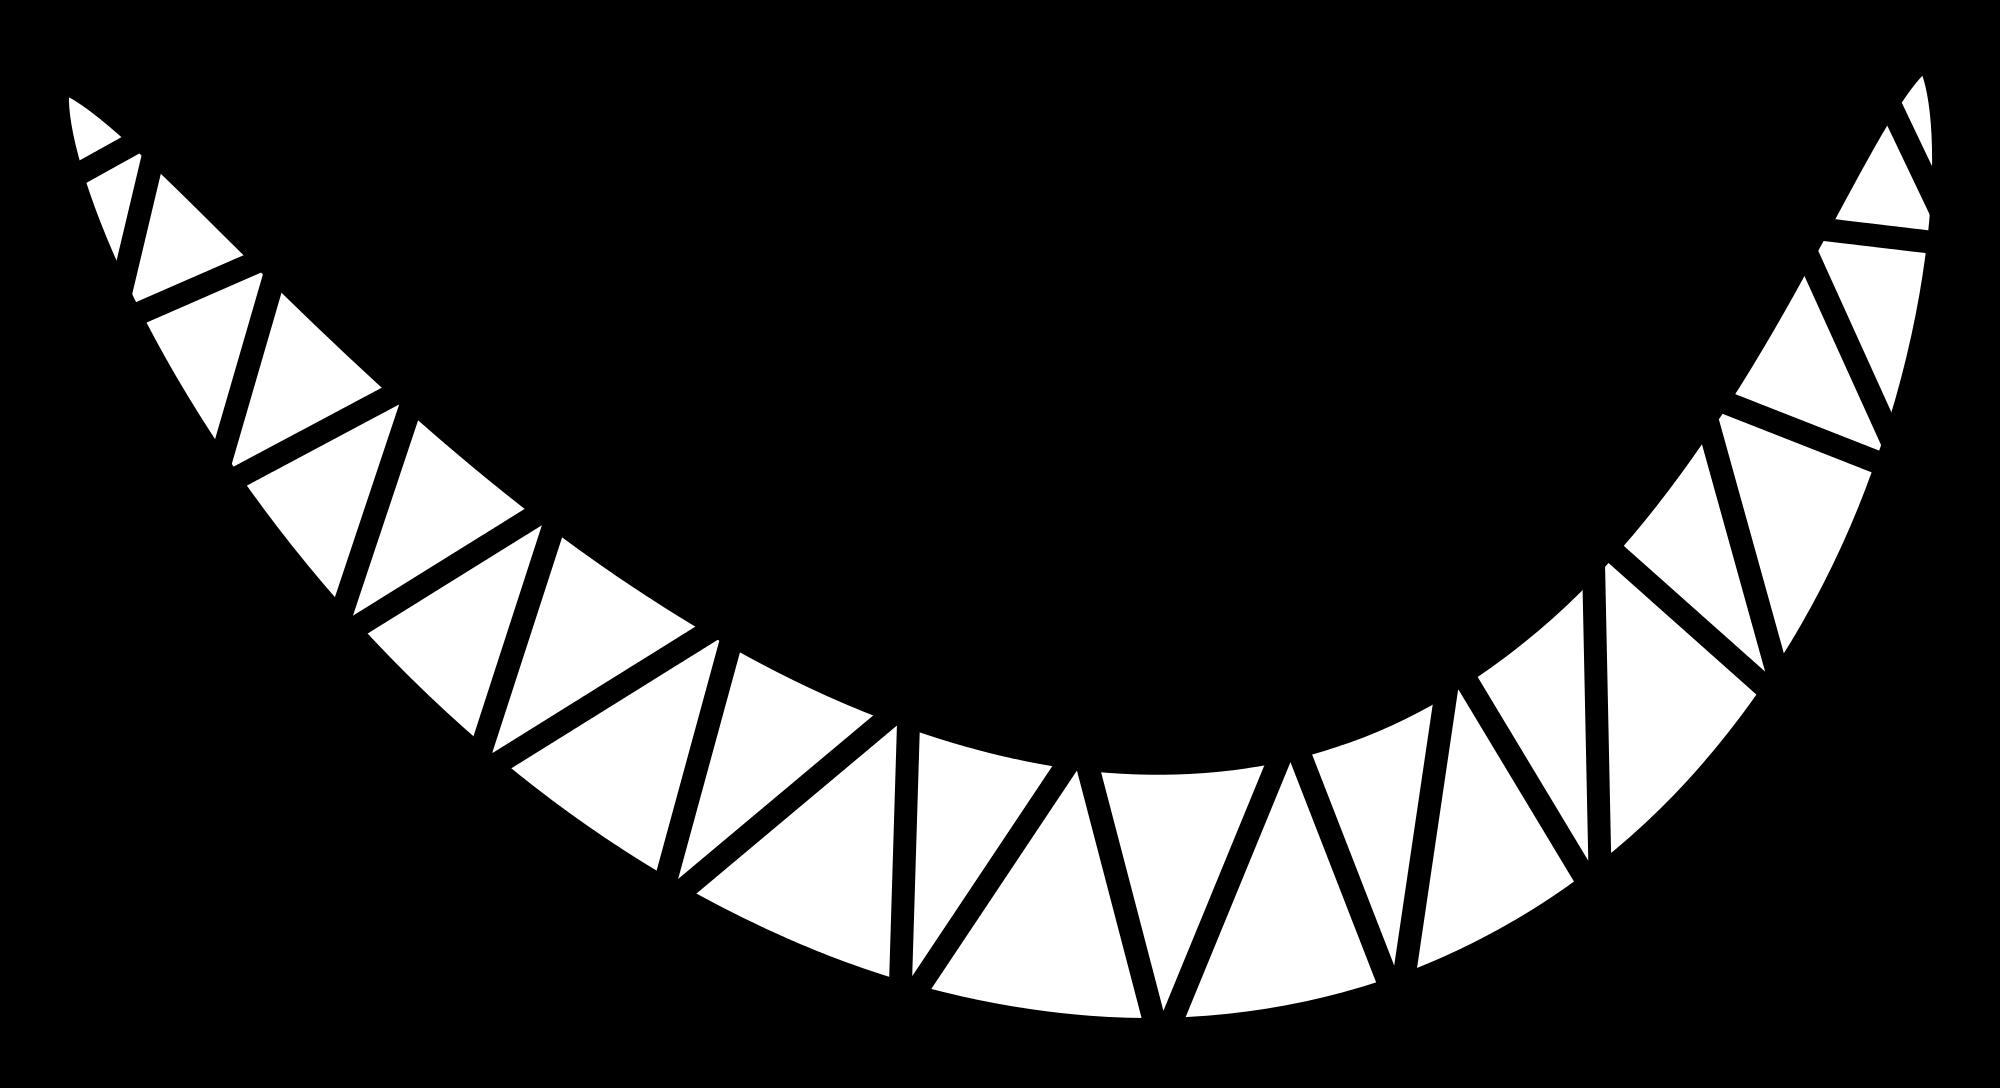 File - Sharp Shark - Svg - Mouth Svg Clipart - Full Size ...